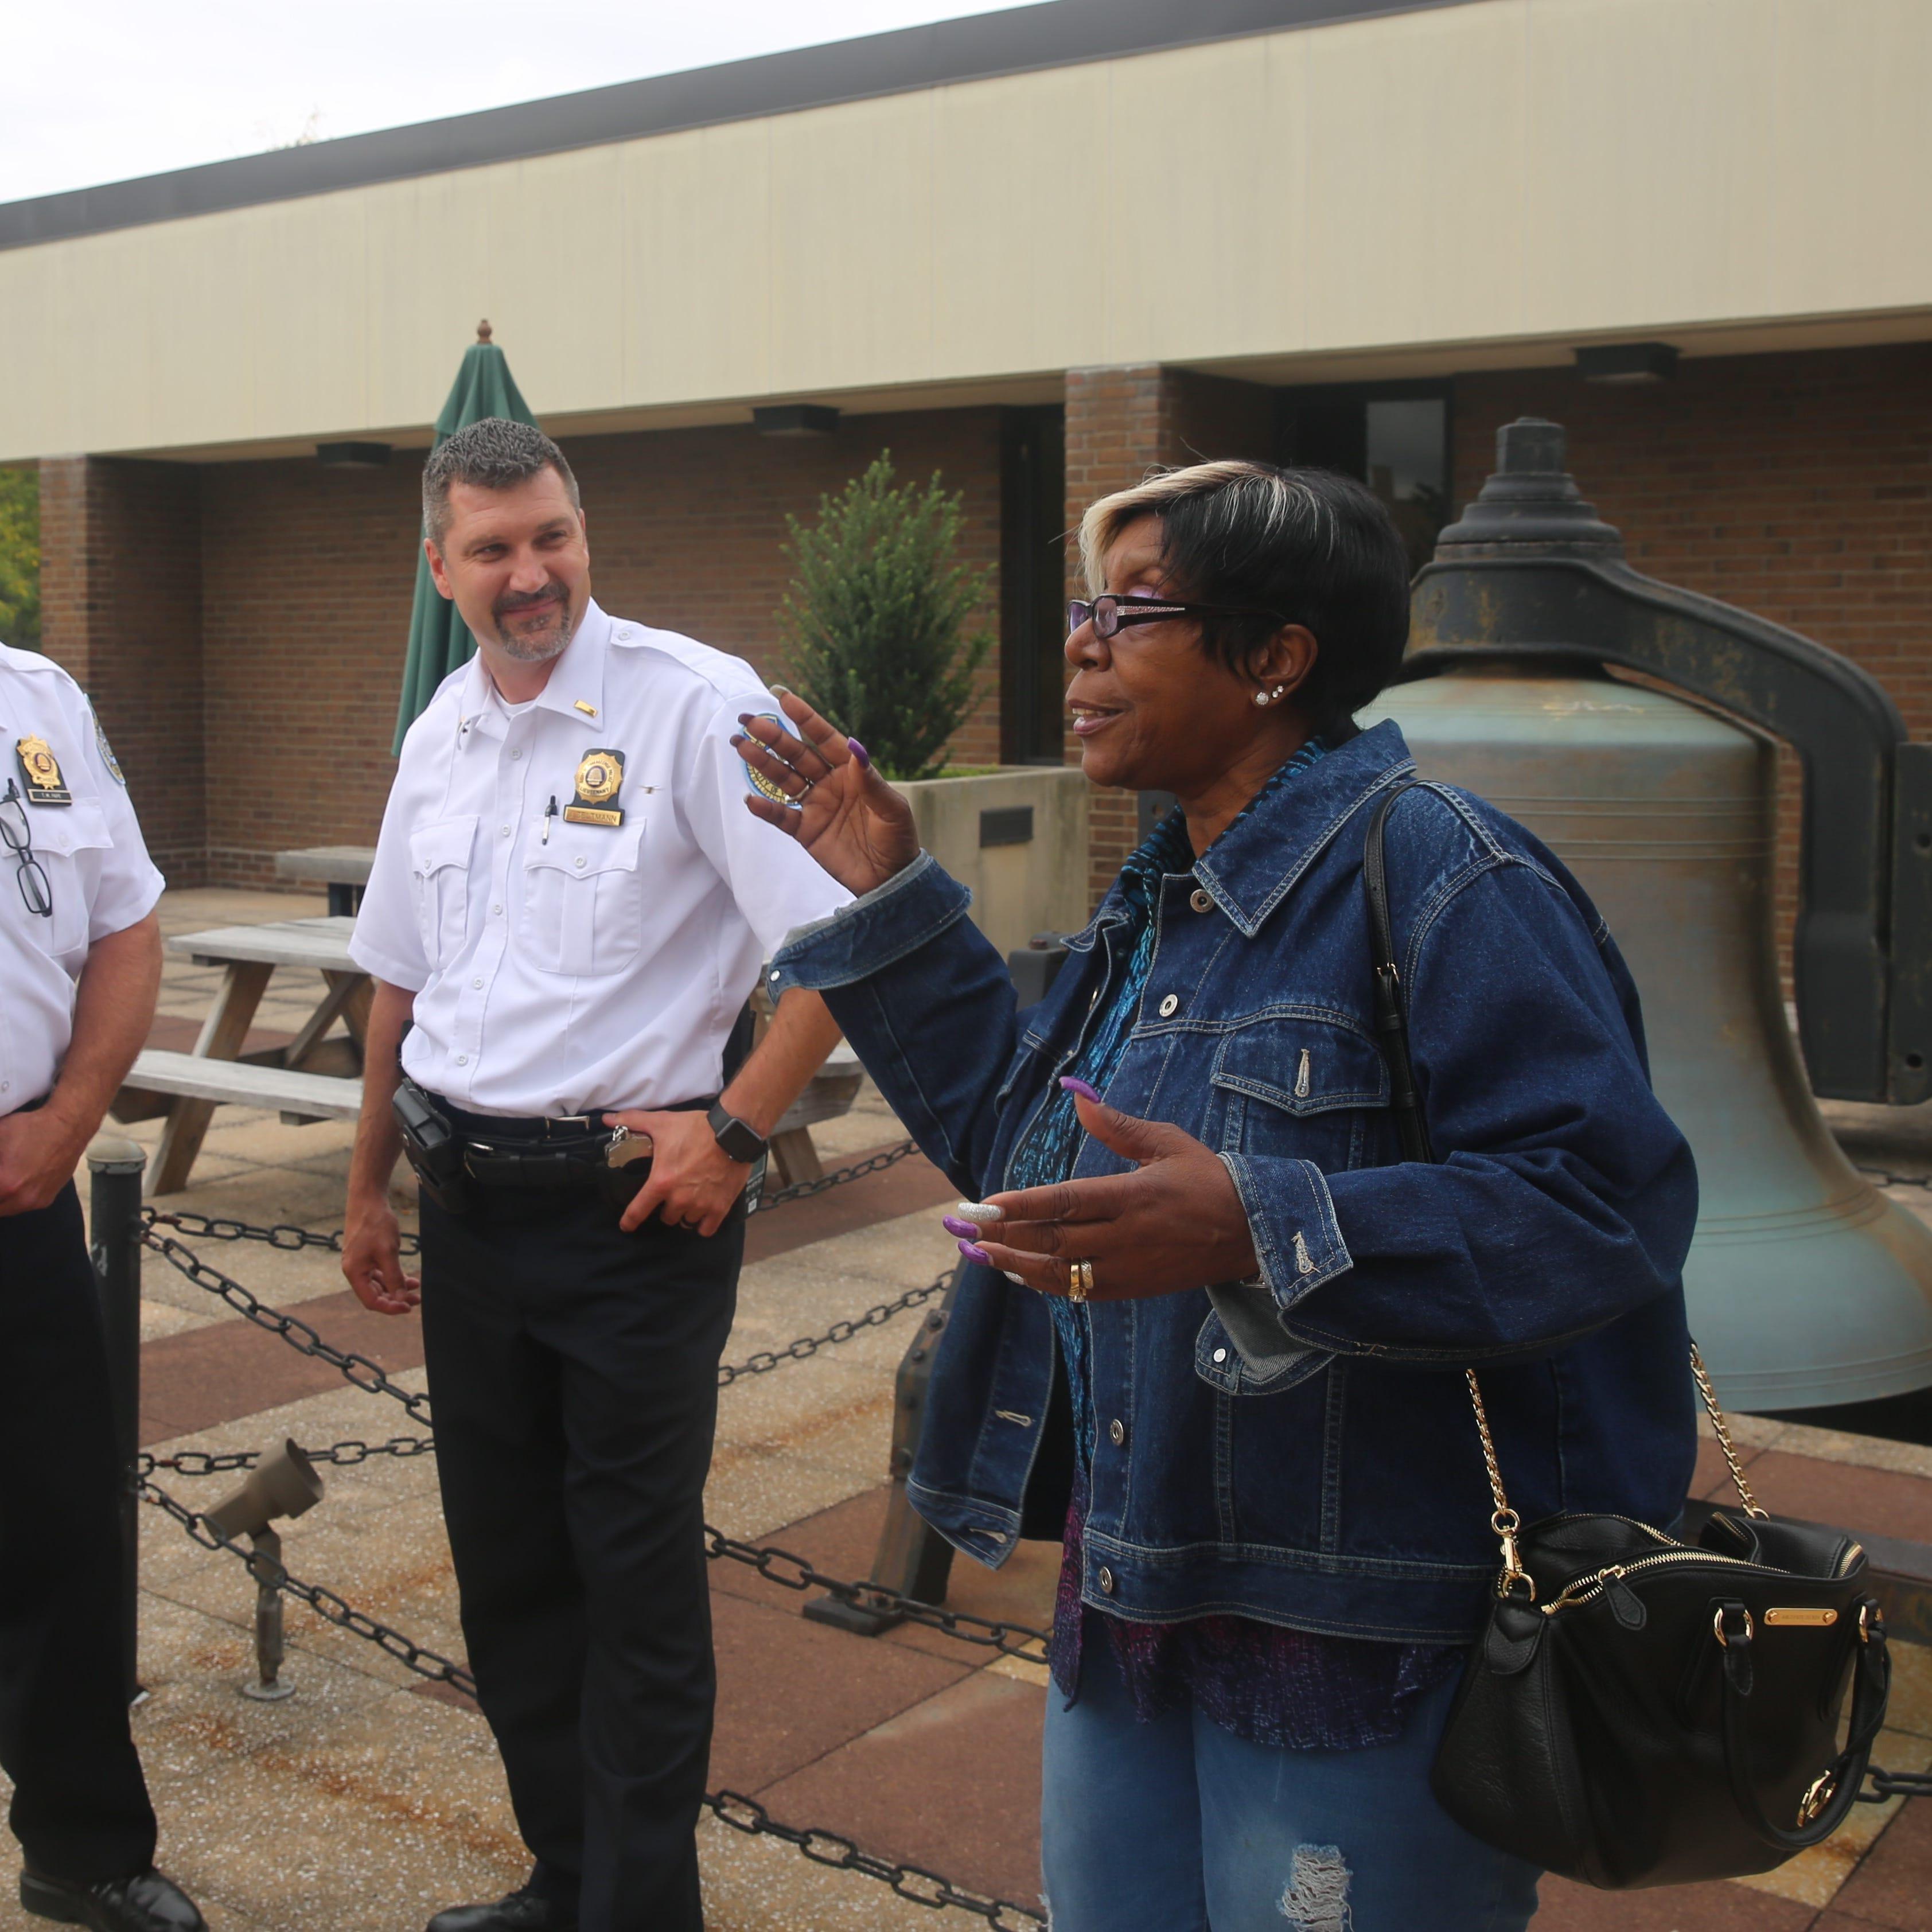 Poughkeepsie police aim to improve community relations through survey